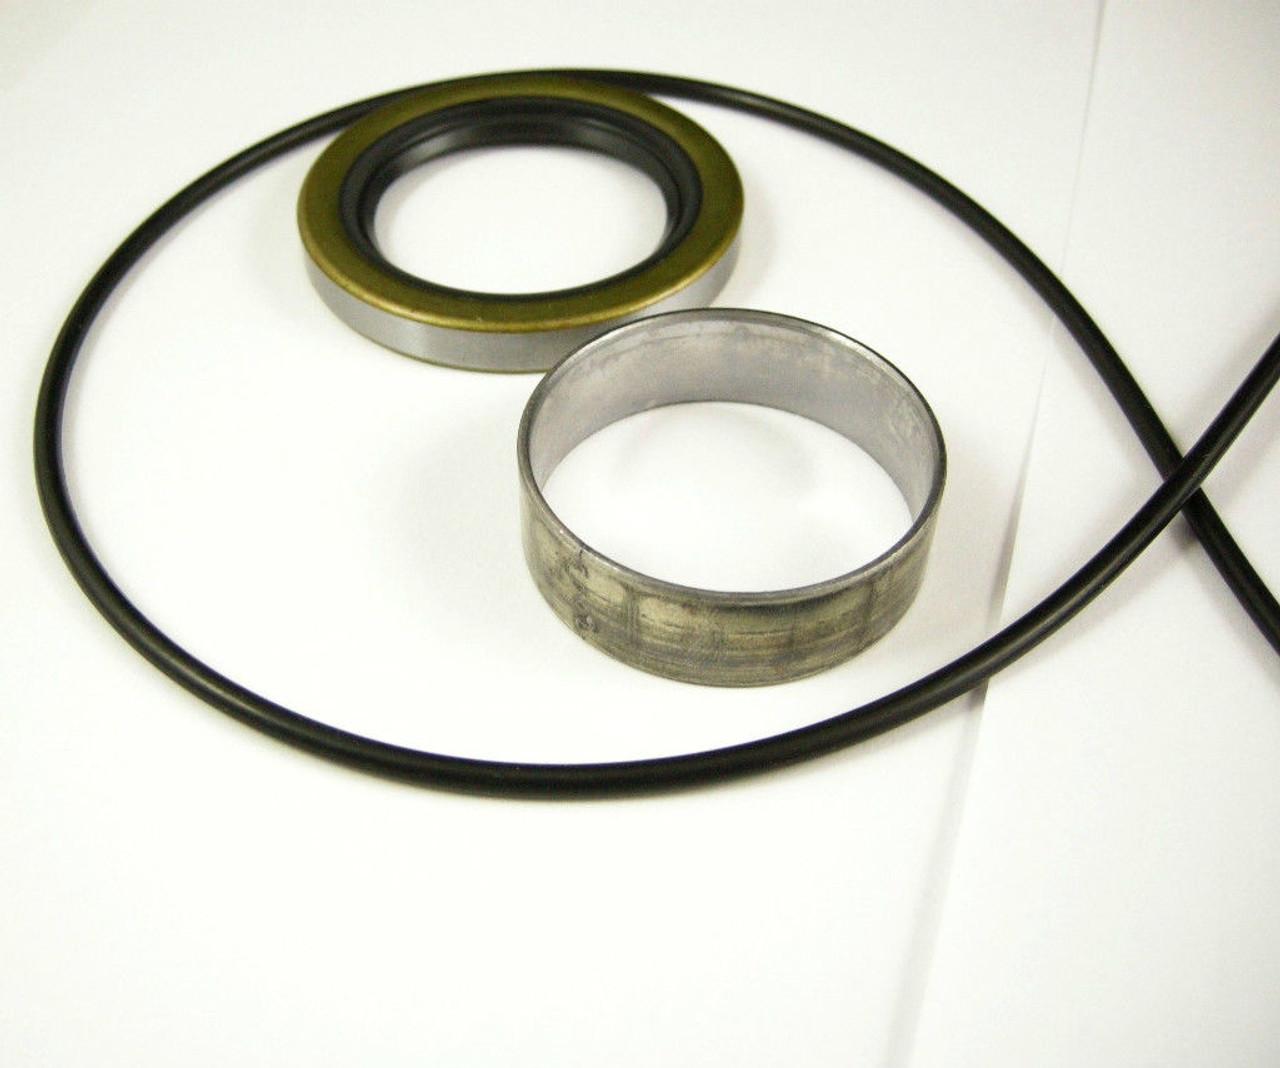 Transparent Hose /& Stainless Black Banjos Pro Braking PBC1197-CLR-BLA Braided Clutch Line